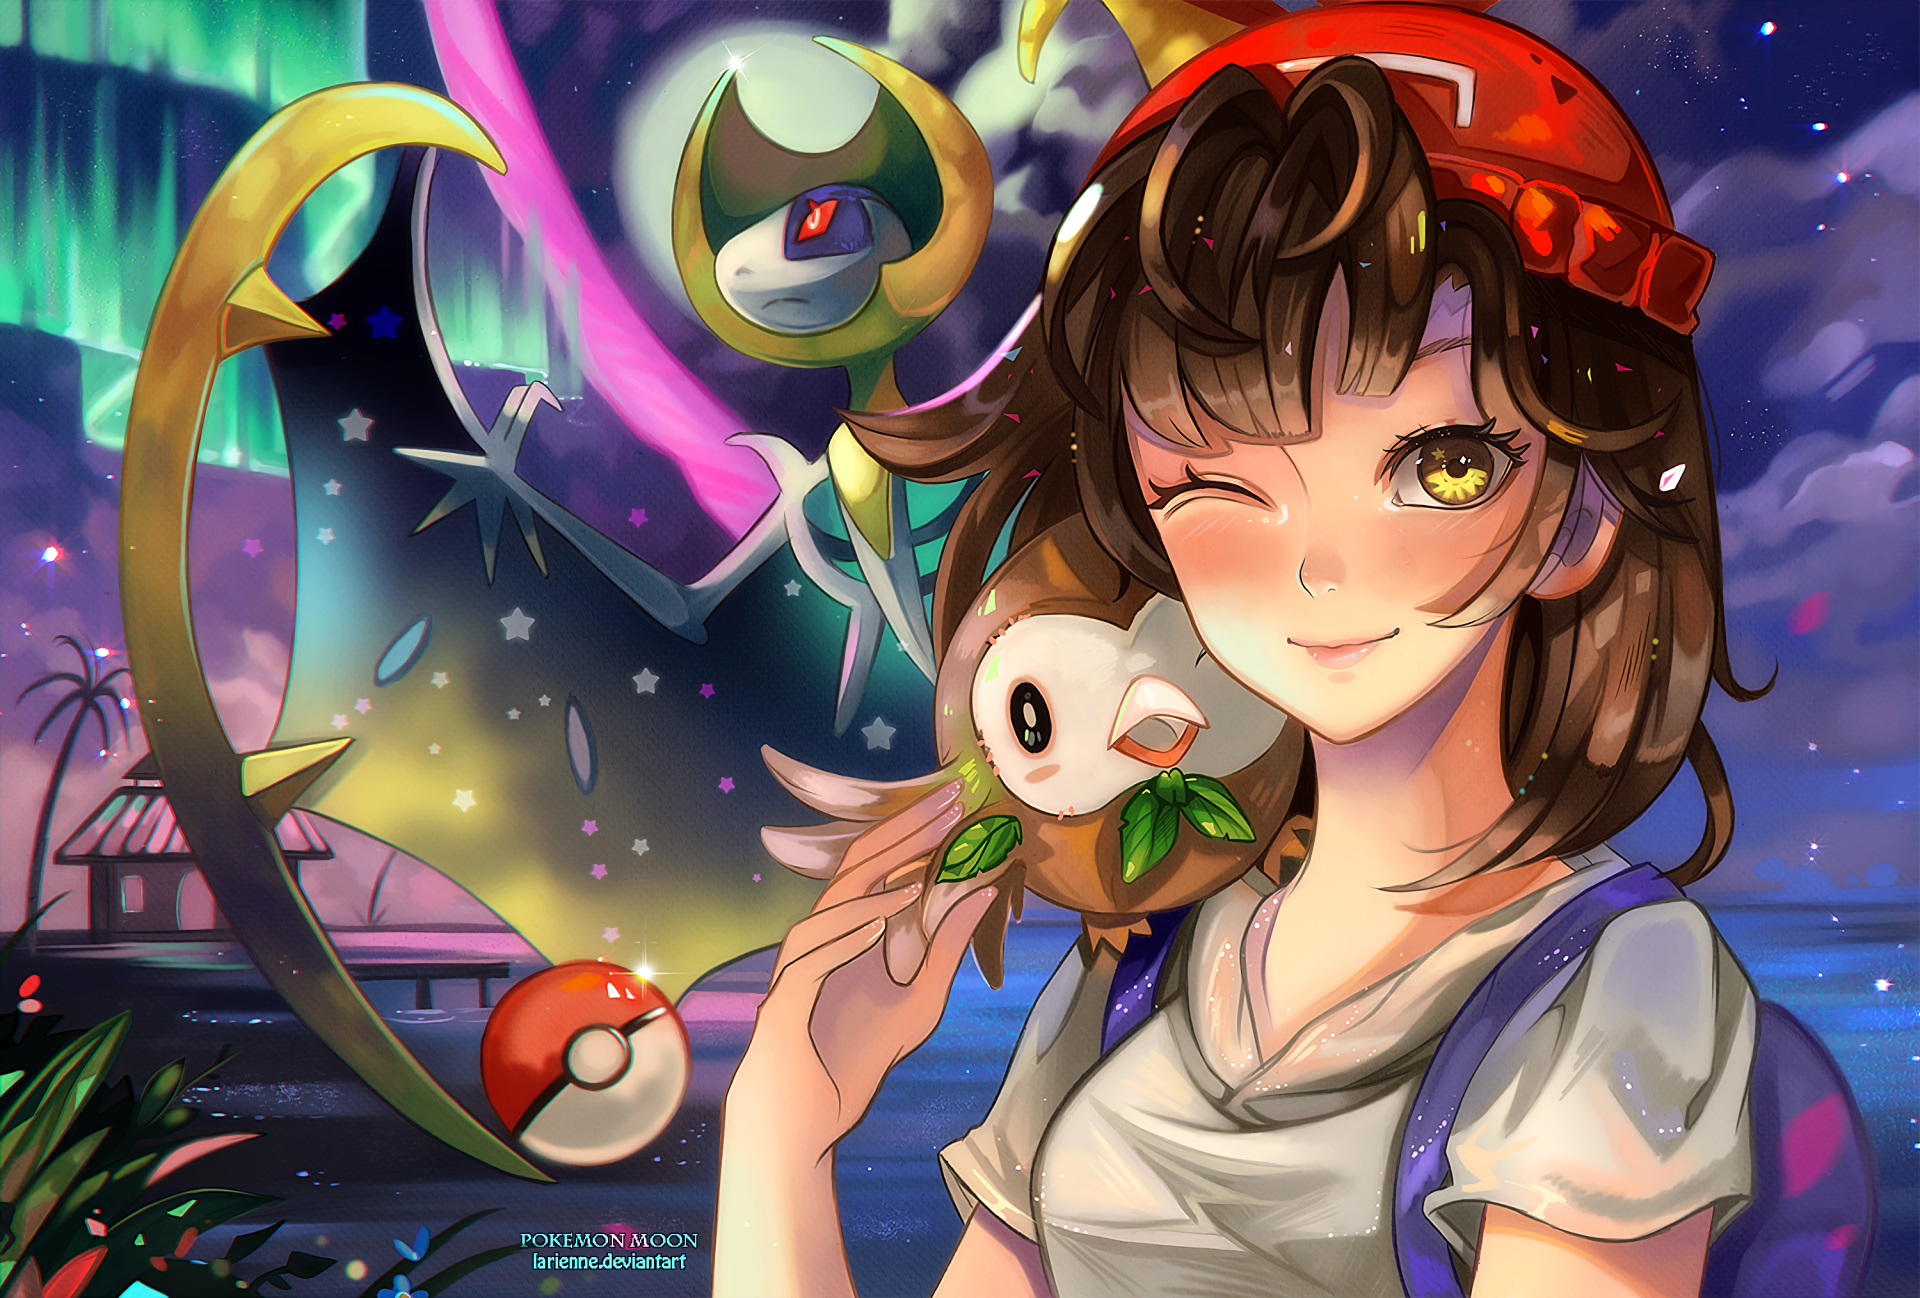 Video Game - Pokémon Sun and Moon  Pokémon Rowlet (Pokémon) Lunala (Pokémon) Wallpaper